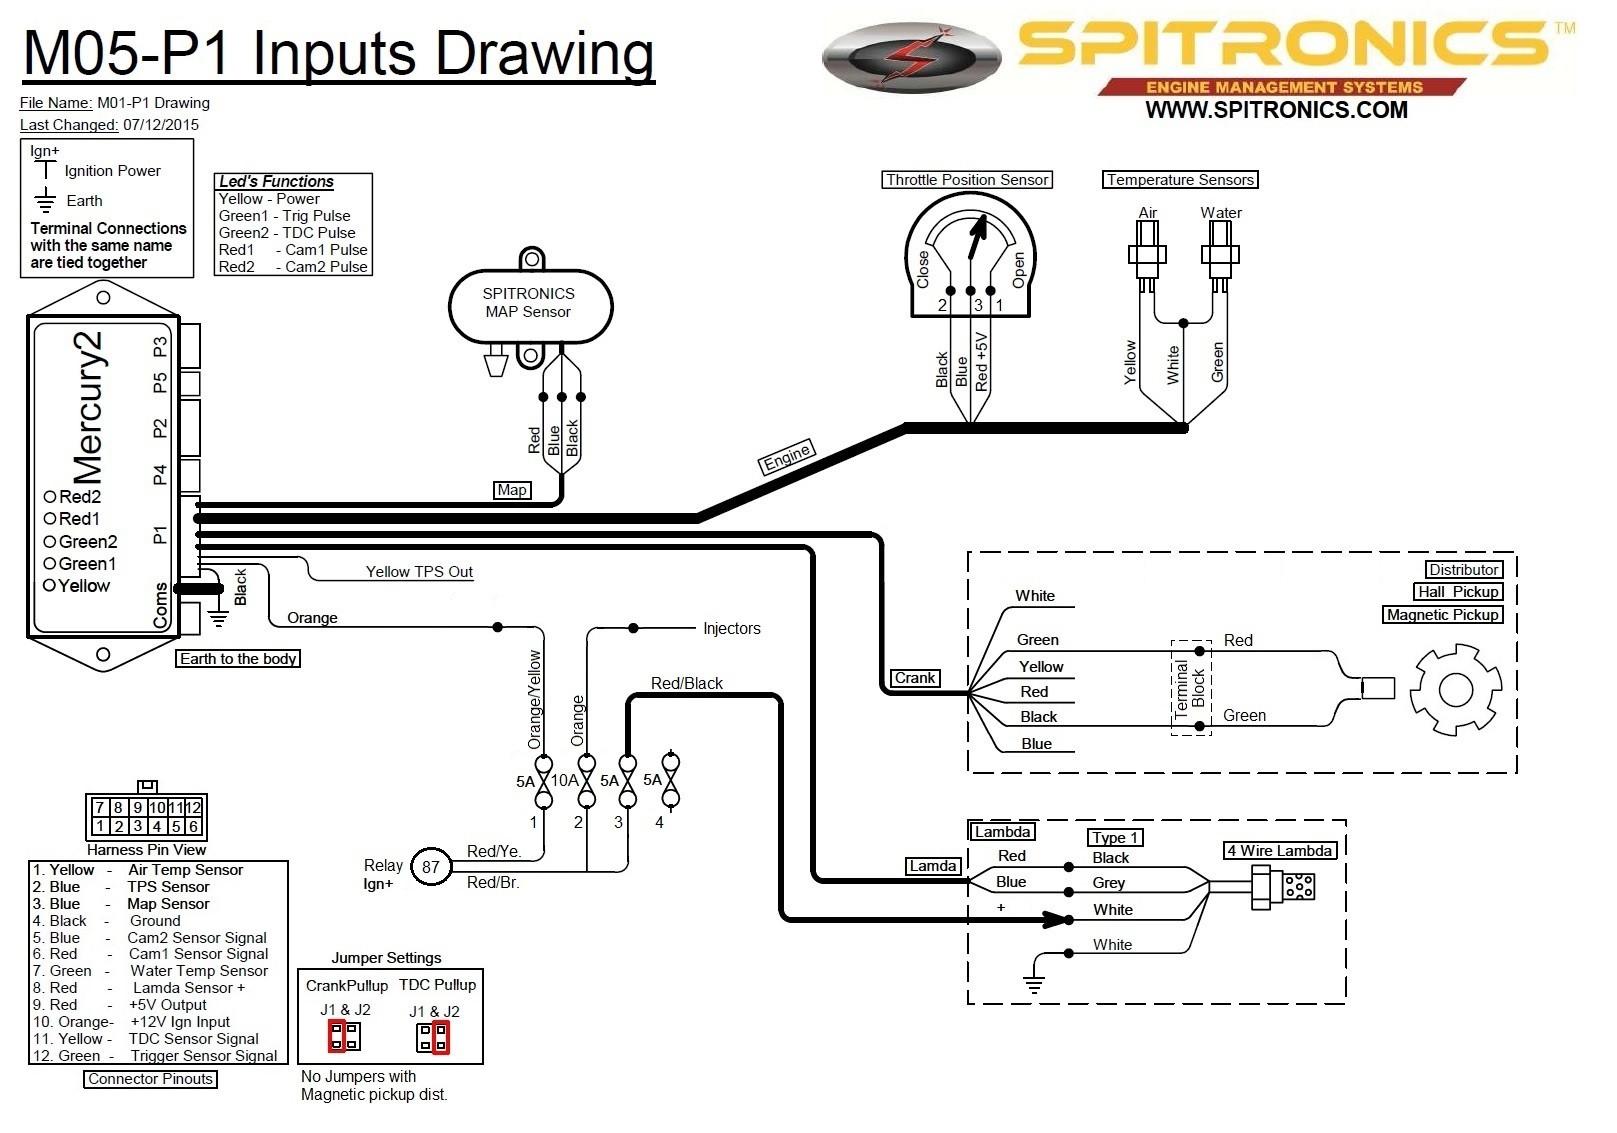 Daiogram Of Spitronic Pluto 2 Wireing Upgrading A 280z Efi to Spitronics Mercury 2 Ecu Page 2 Fuel Injection the Classic Zcar Club Of Daiogram Of Spitronic Pluto 2 Wireing